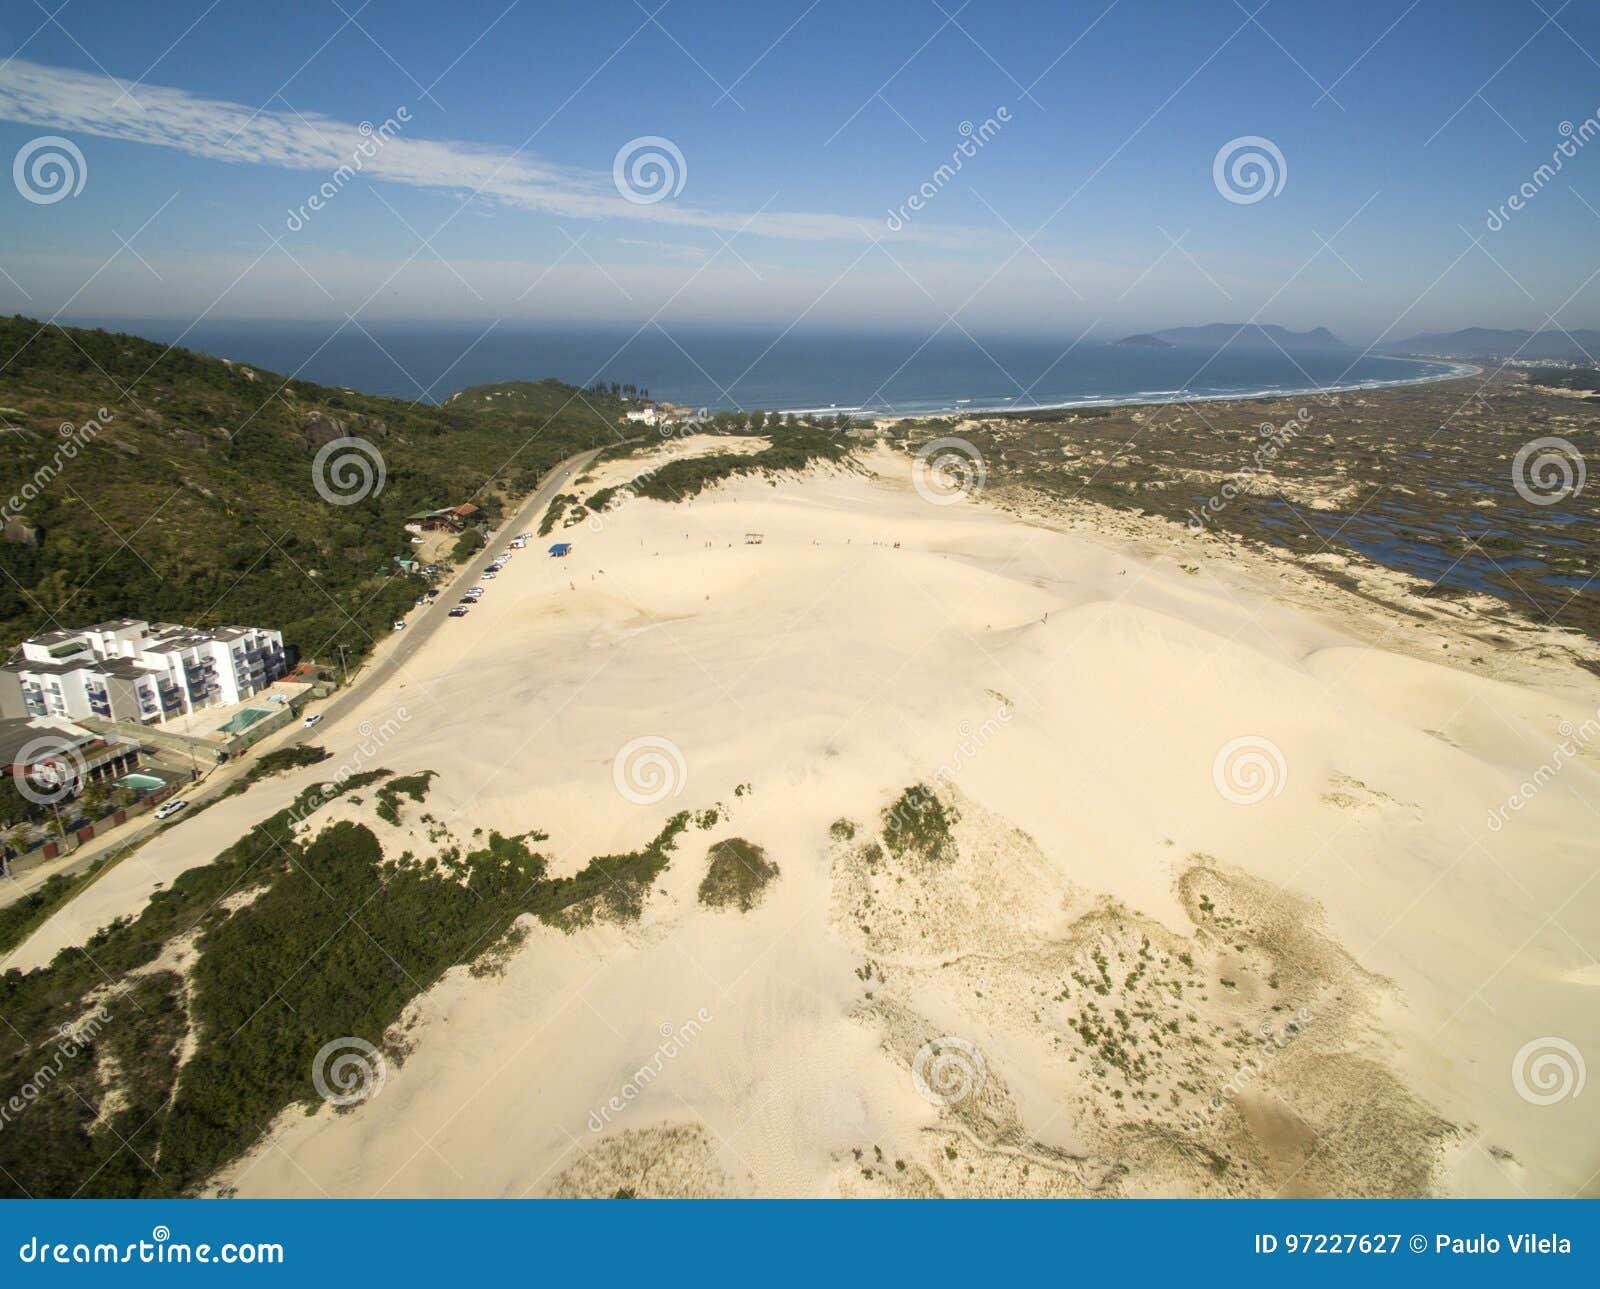 Luchtmeningsduinen in zonnige dag - Joaquina-strand - Florianopolis - Santa Catarina - Brazilië Juli 2017